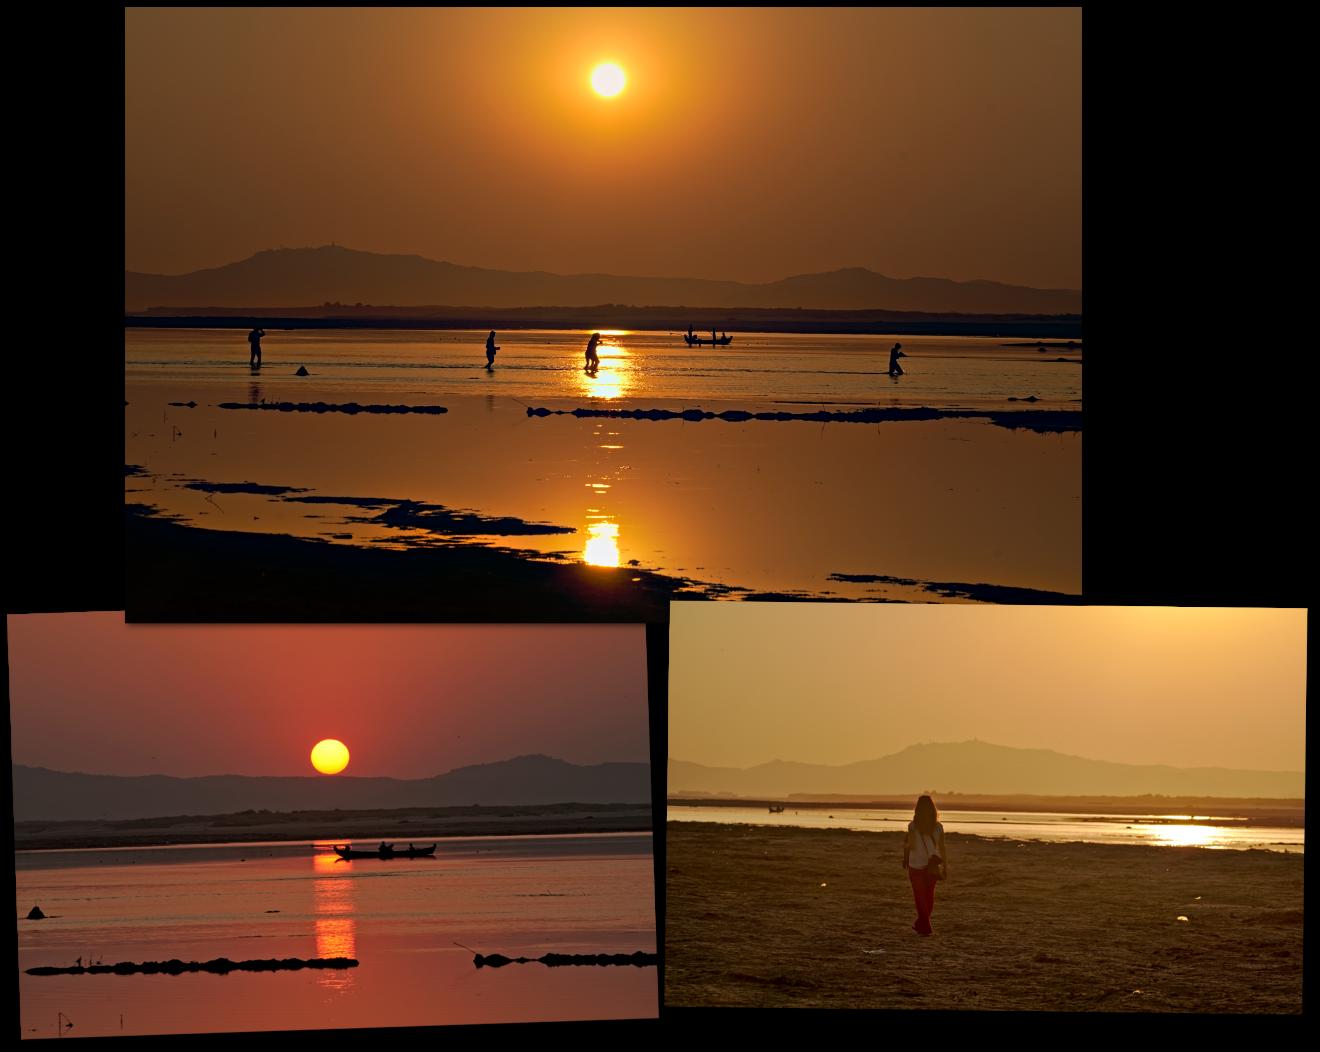 irrawady river sunset bagan